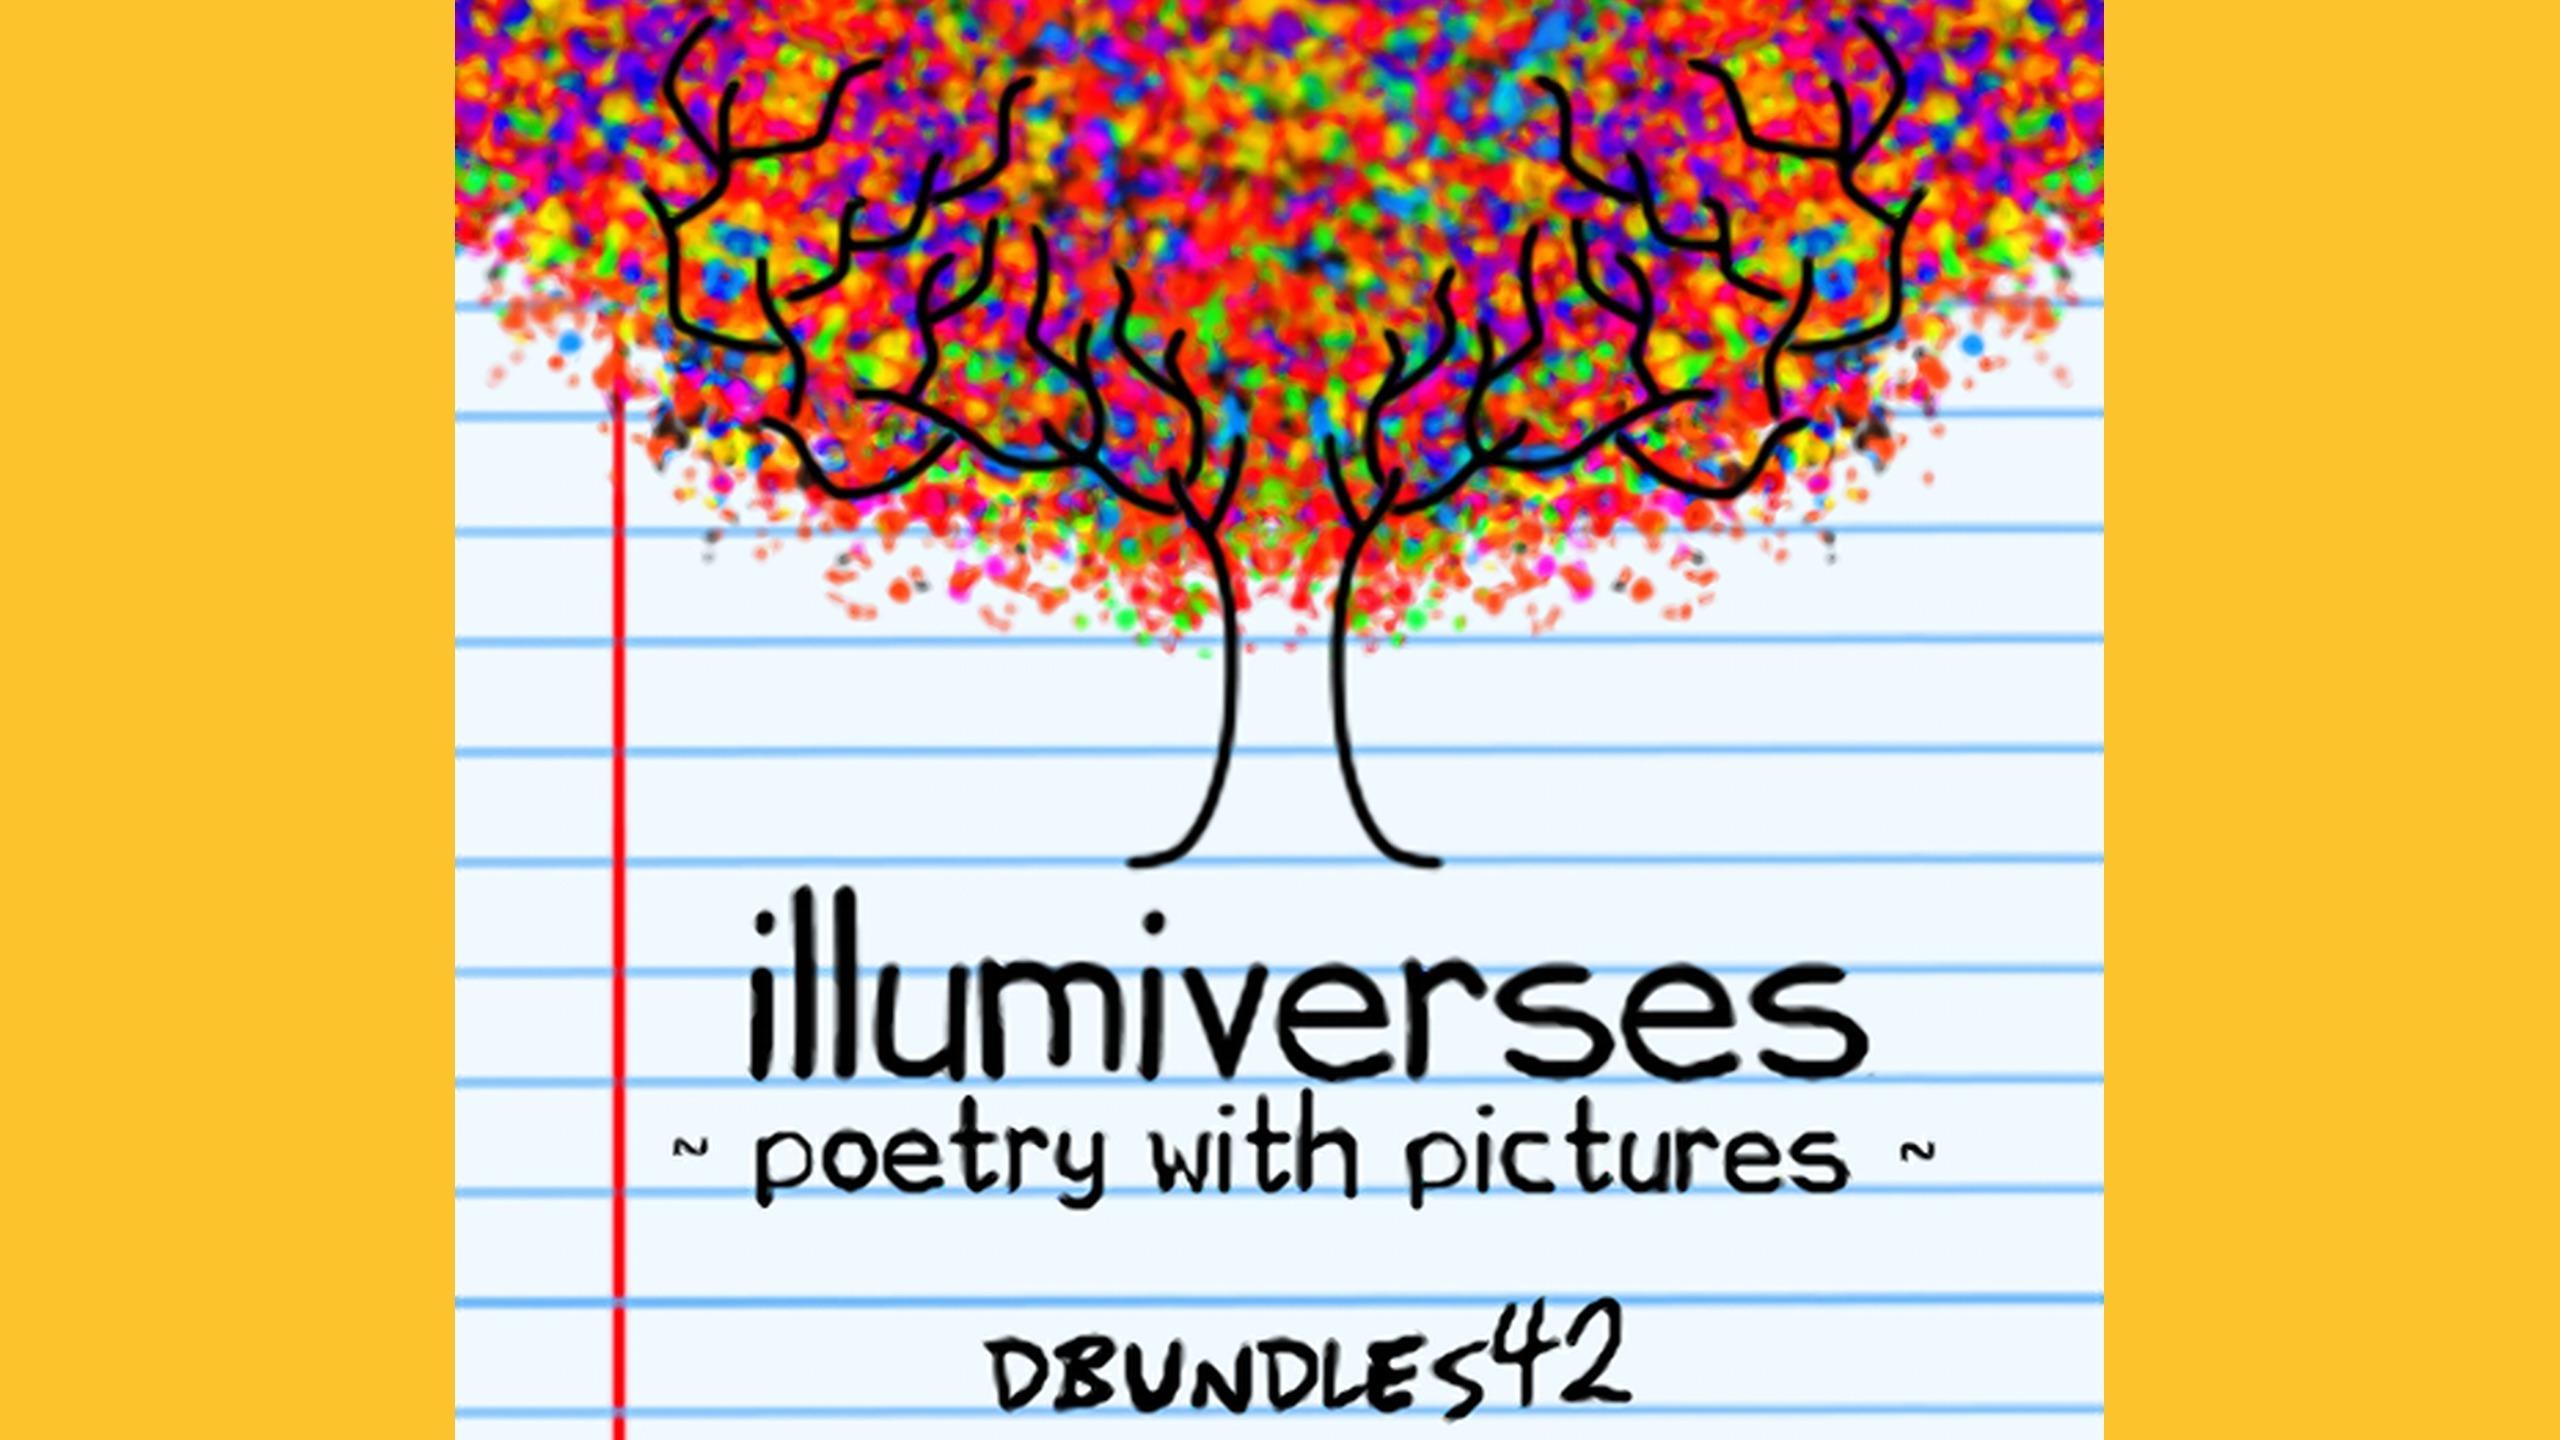 dbundles42 (@dbundles42) Cover Image